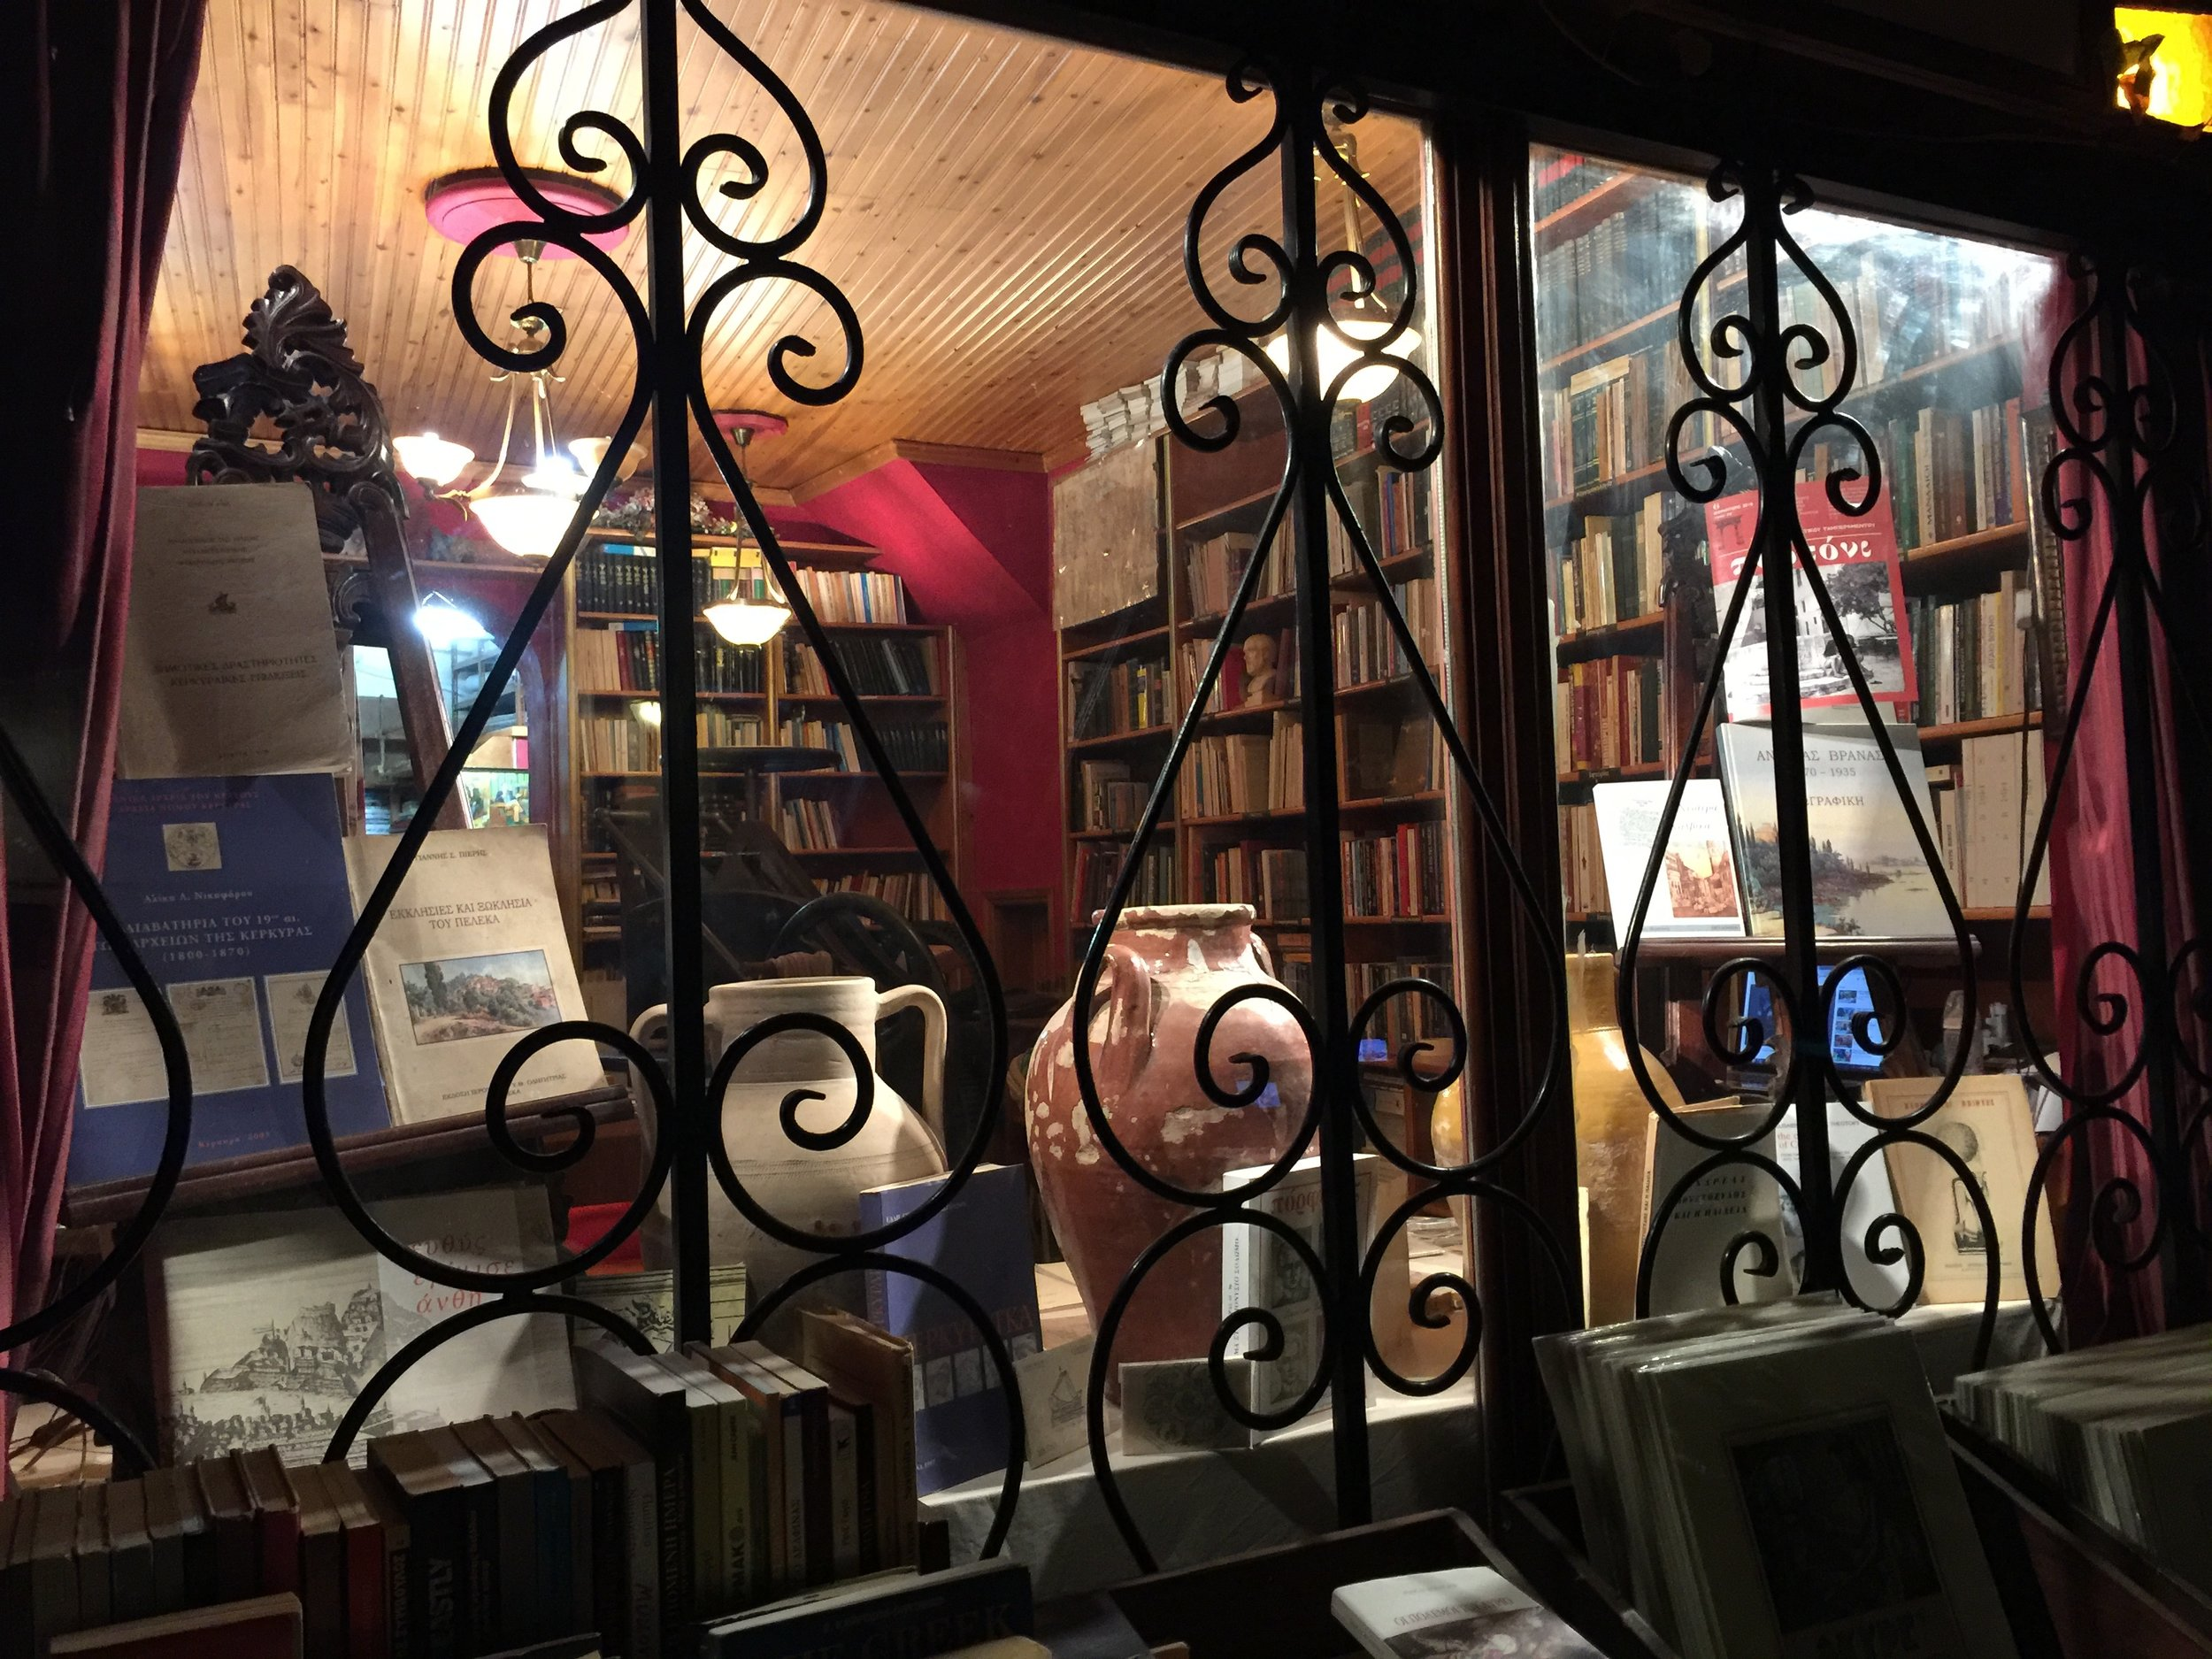 Oldest Bookbinding store in Mediterranean